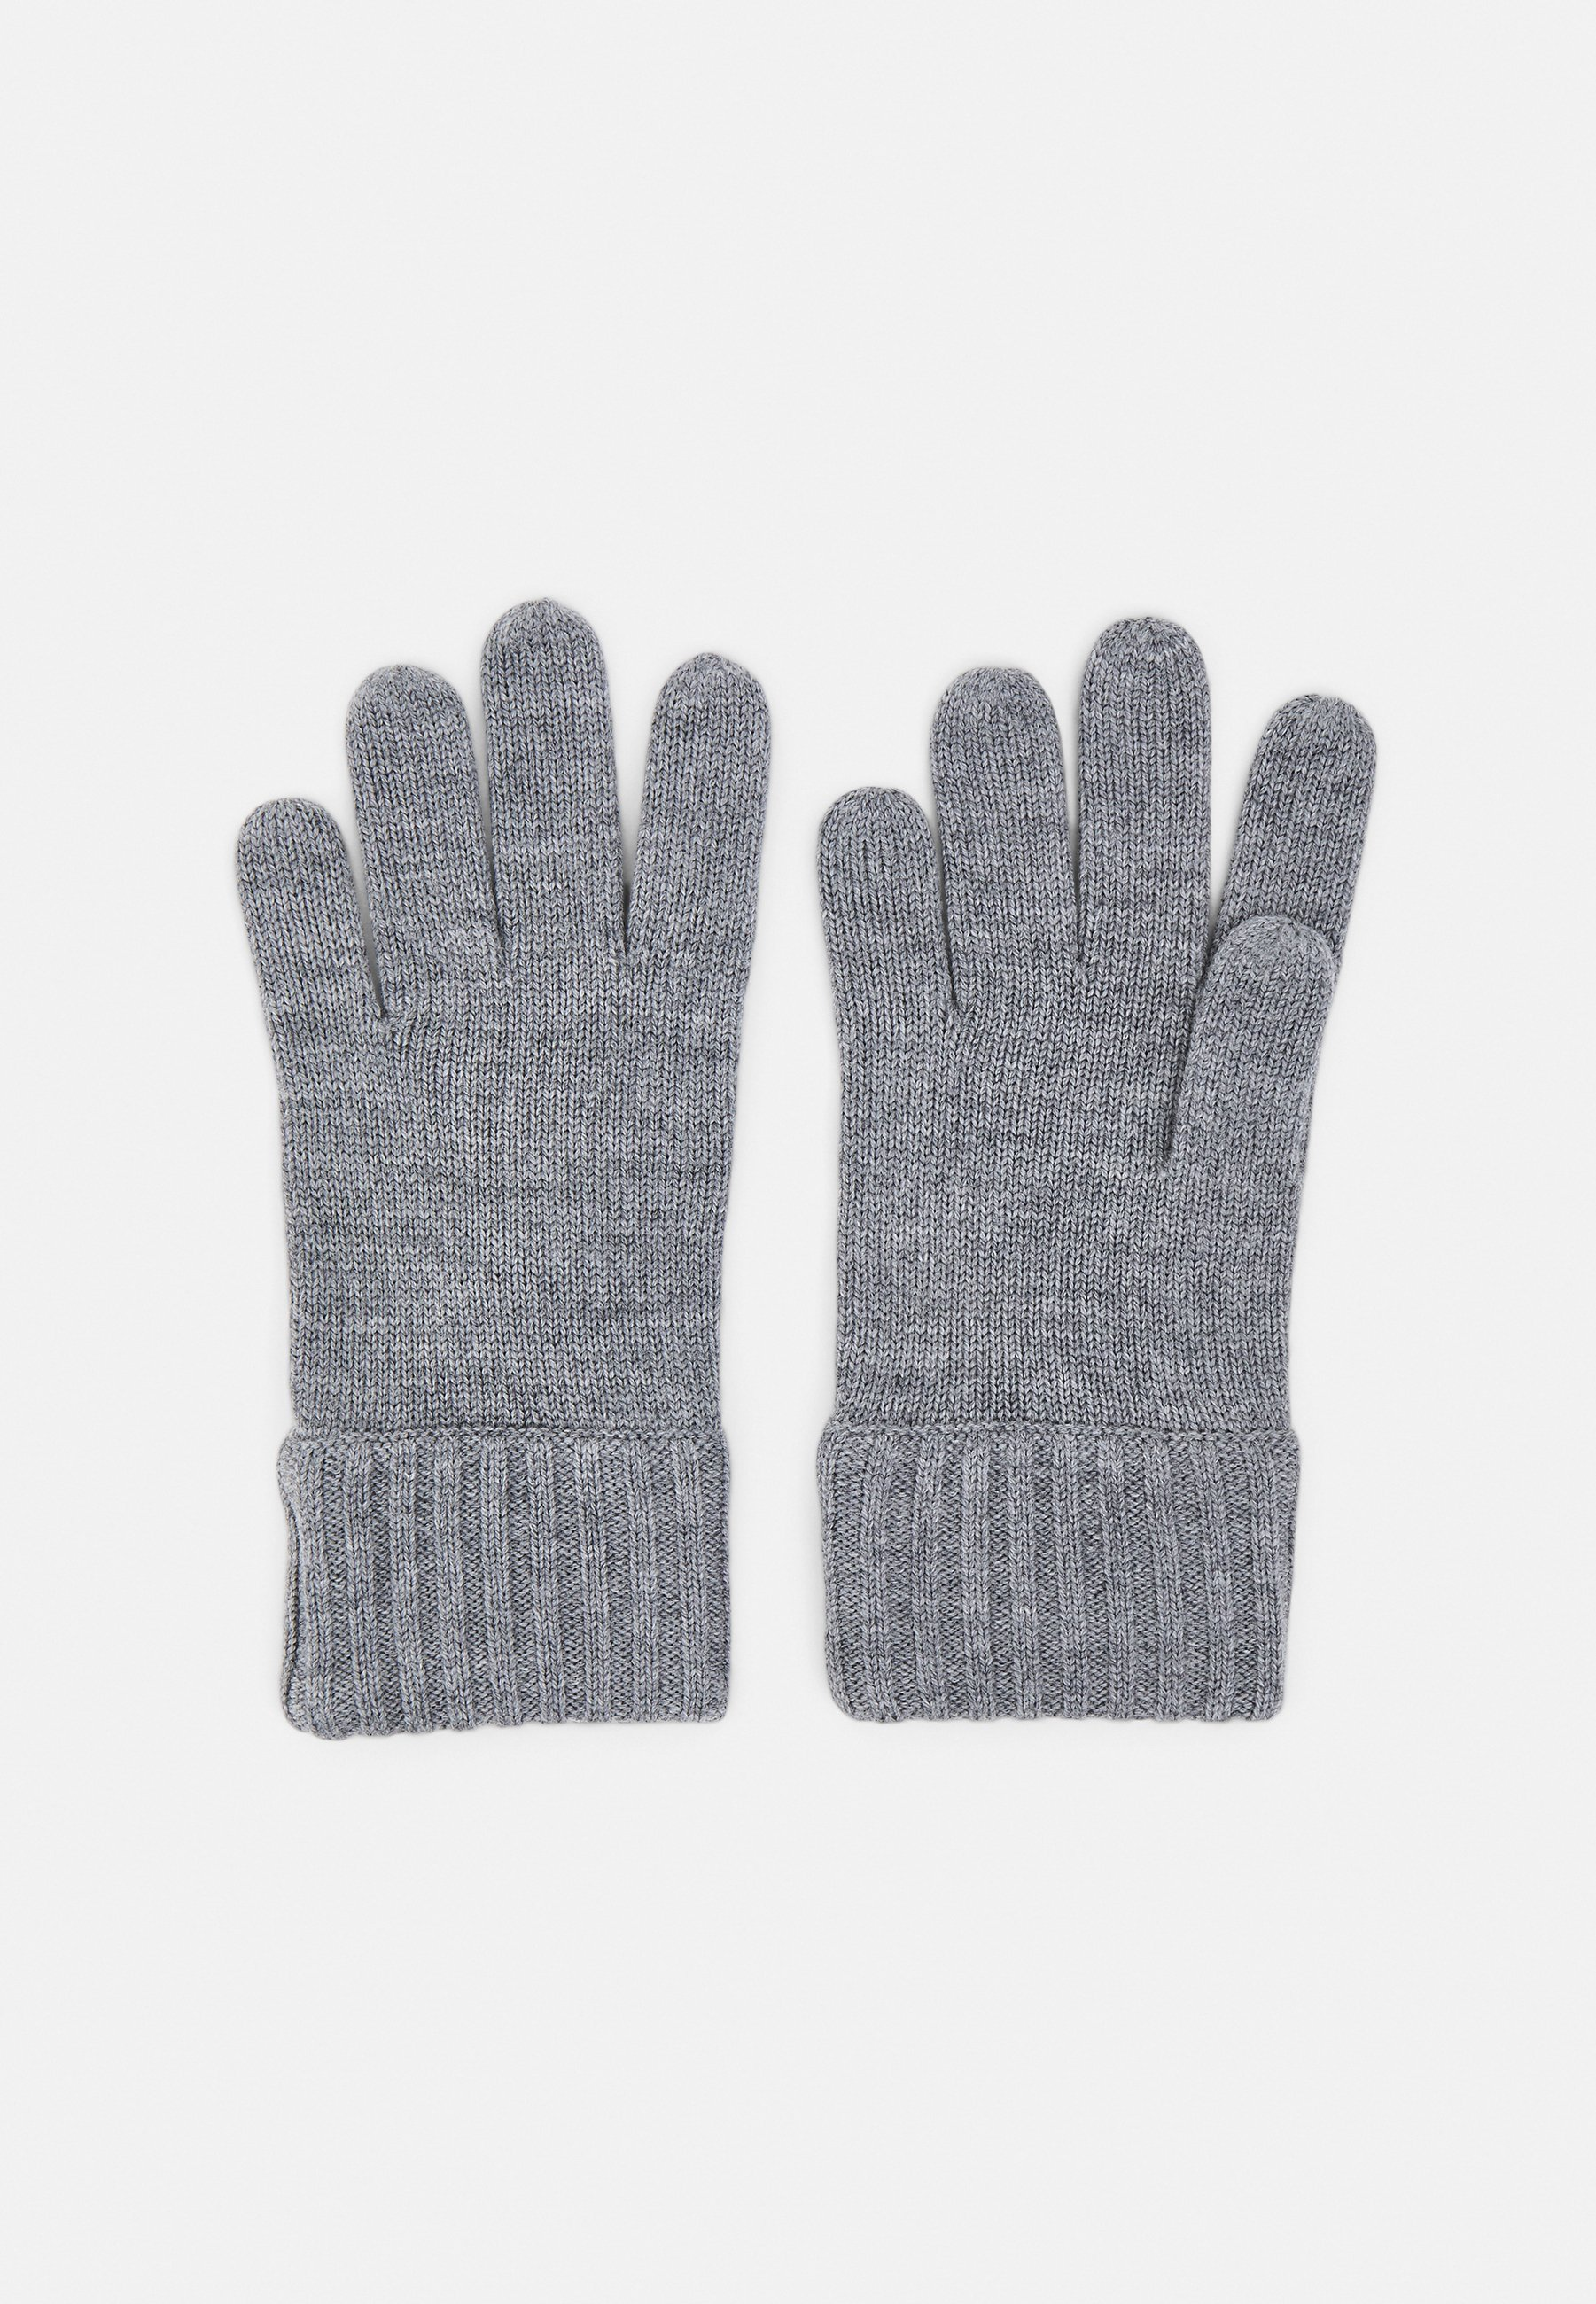 Kinder APPAREL ACCESSORIES GLOVE UNISEX - Fingerhandschuh